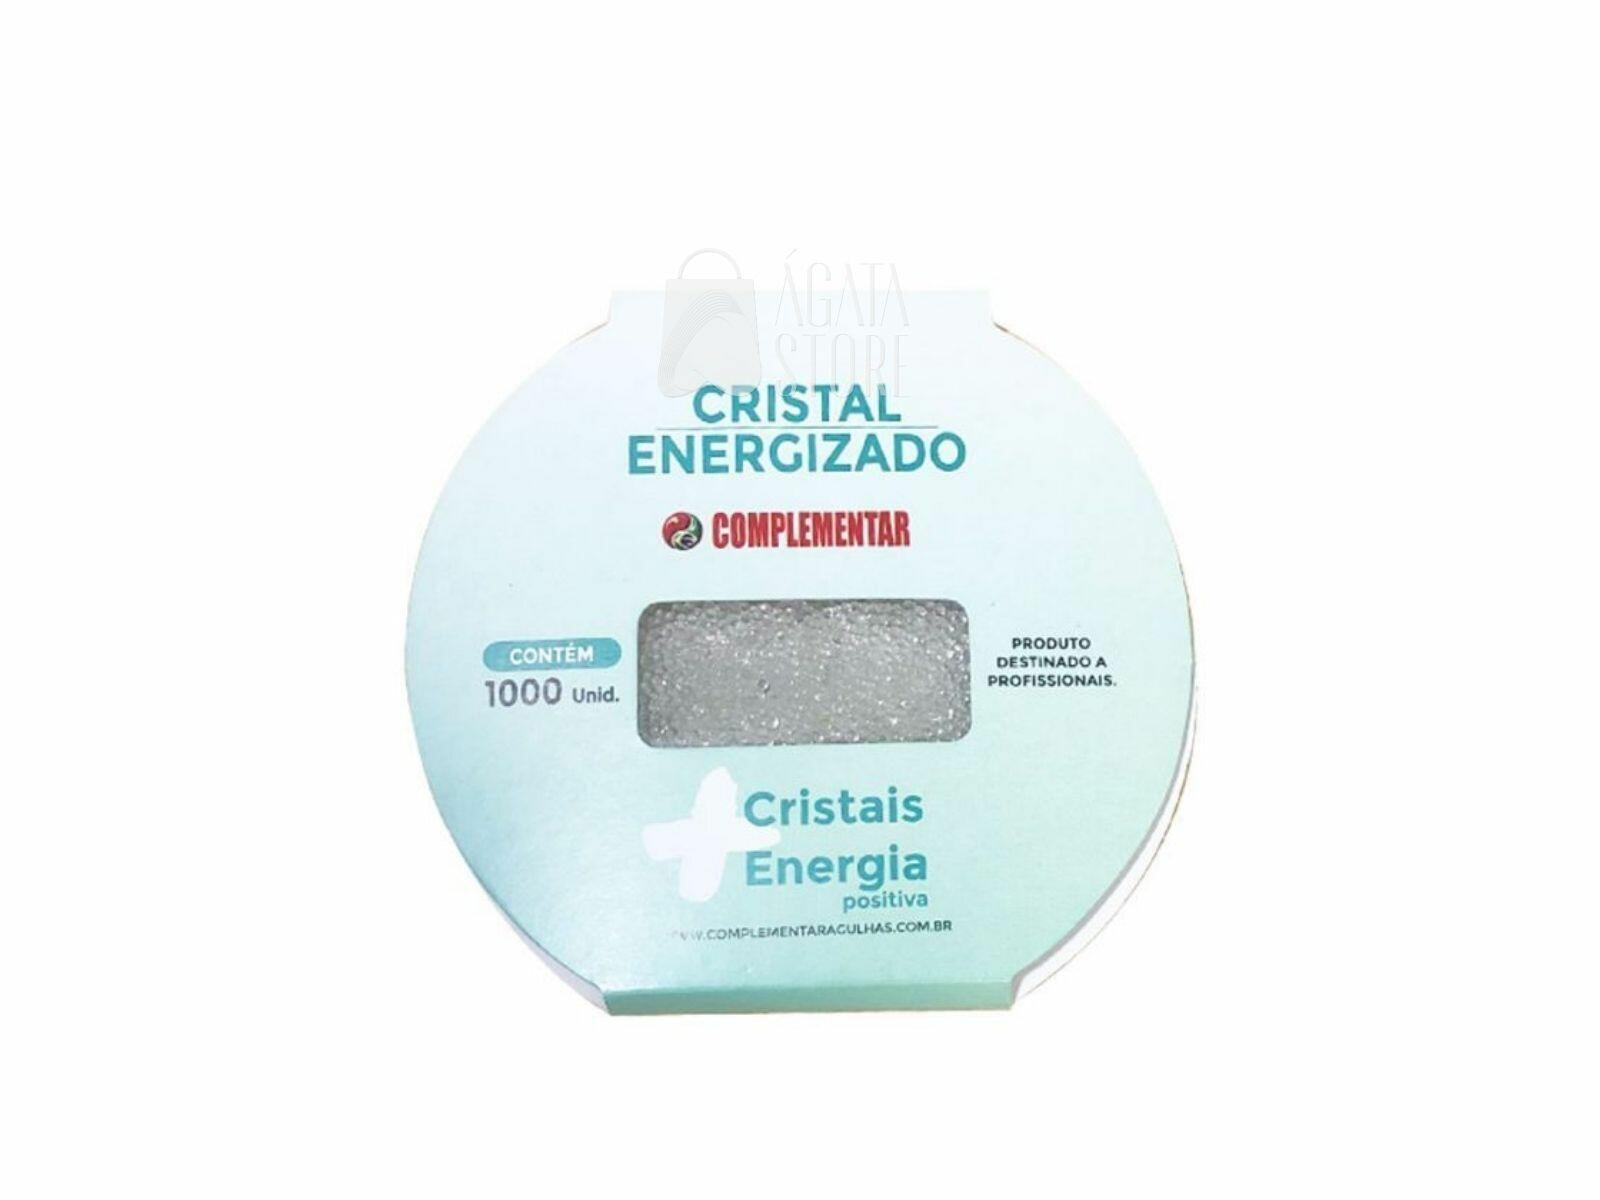 Cristal Energizado   mil unidades - Complementar